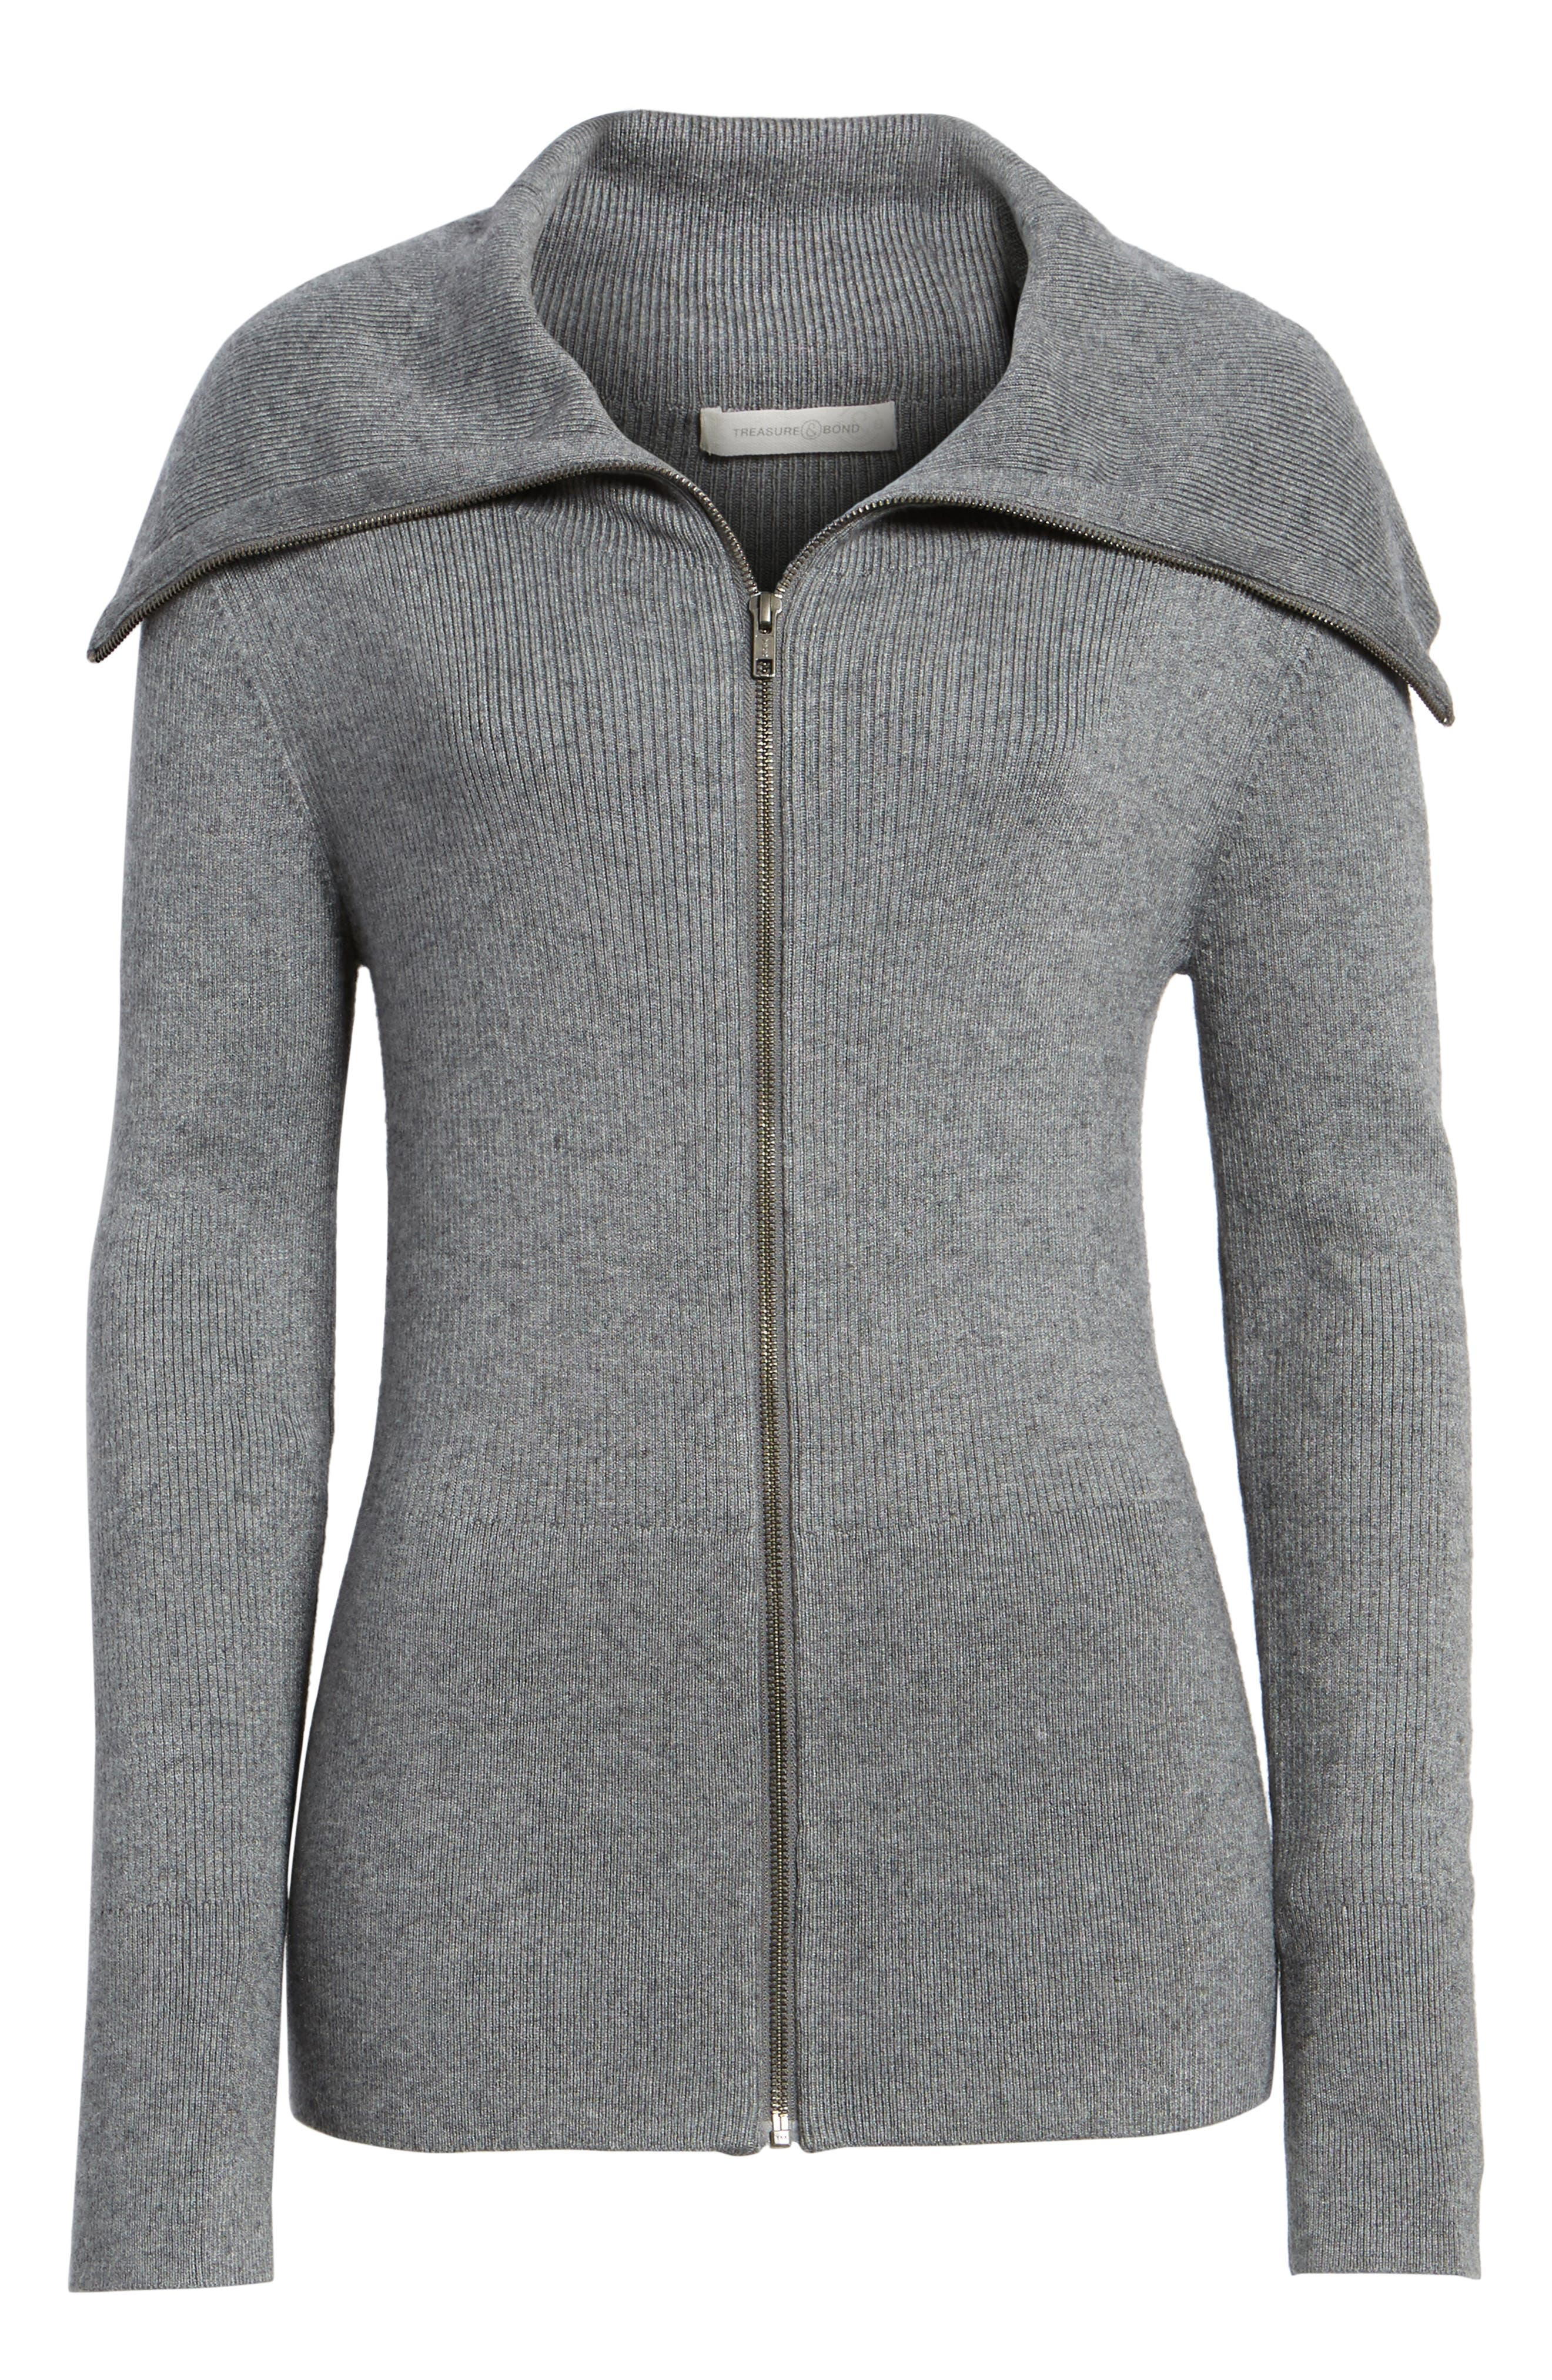 Wide Collar Zip Sweater,                             Alternate thumbnail 6, color,                             Grey Dark Heather